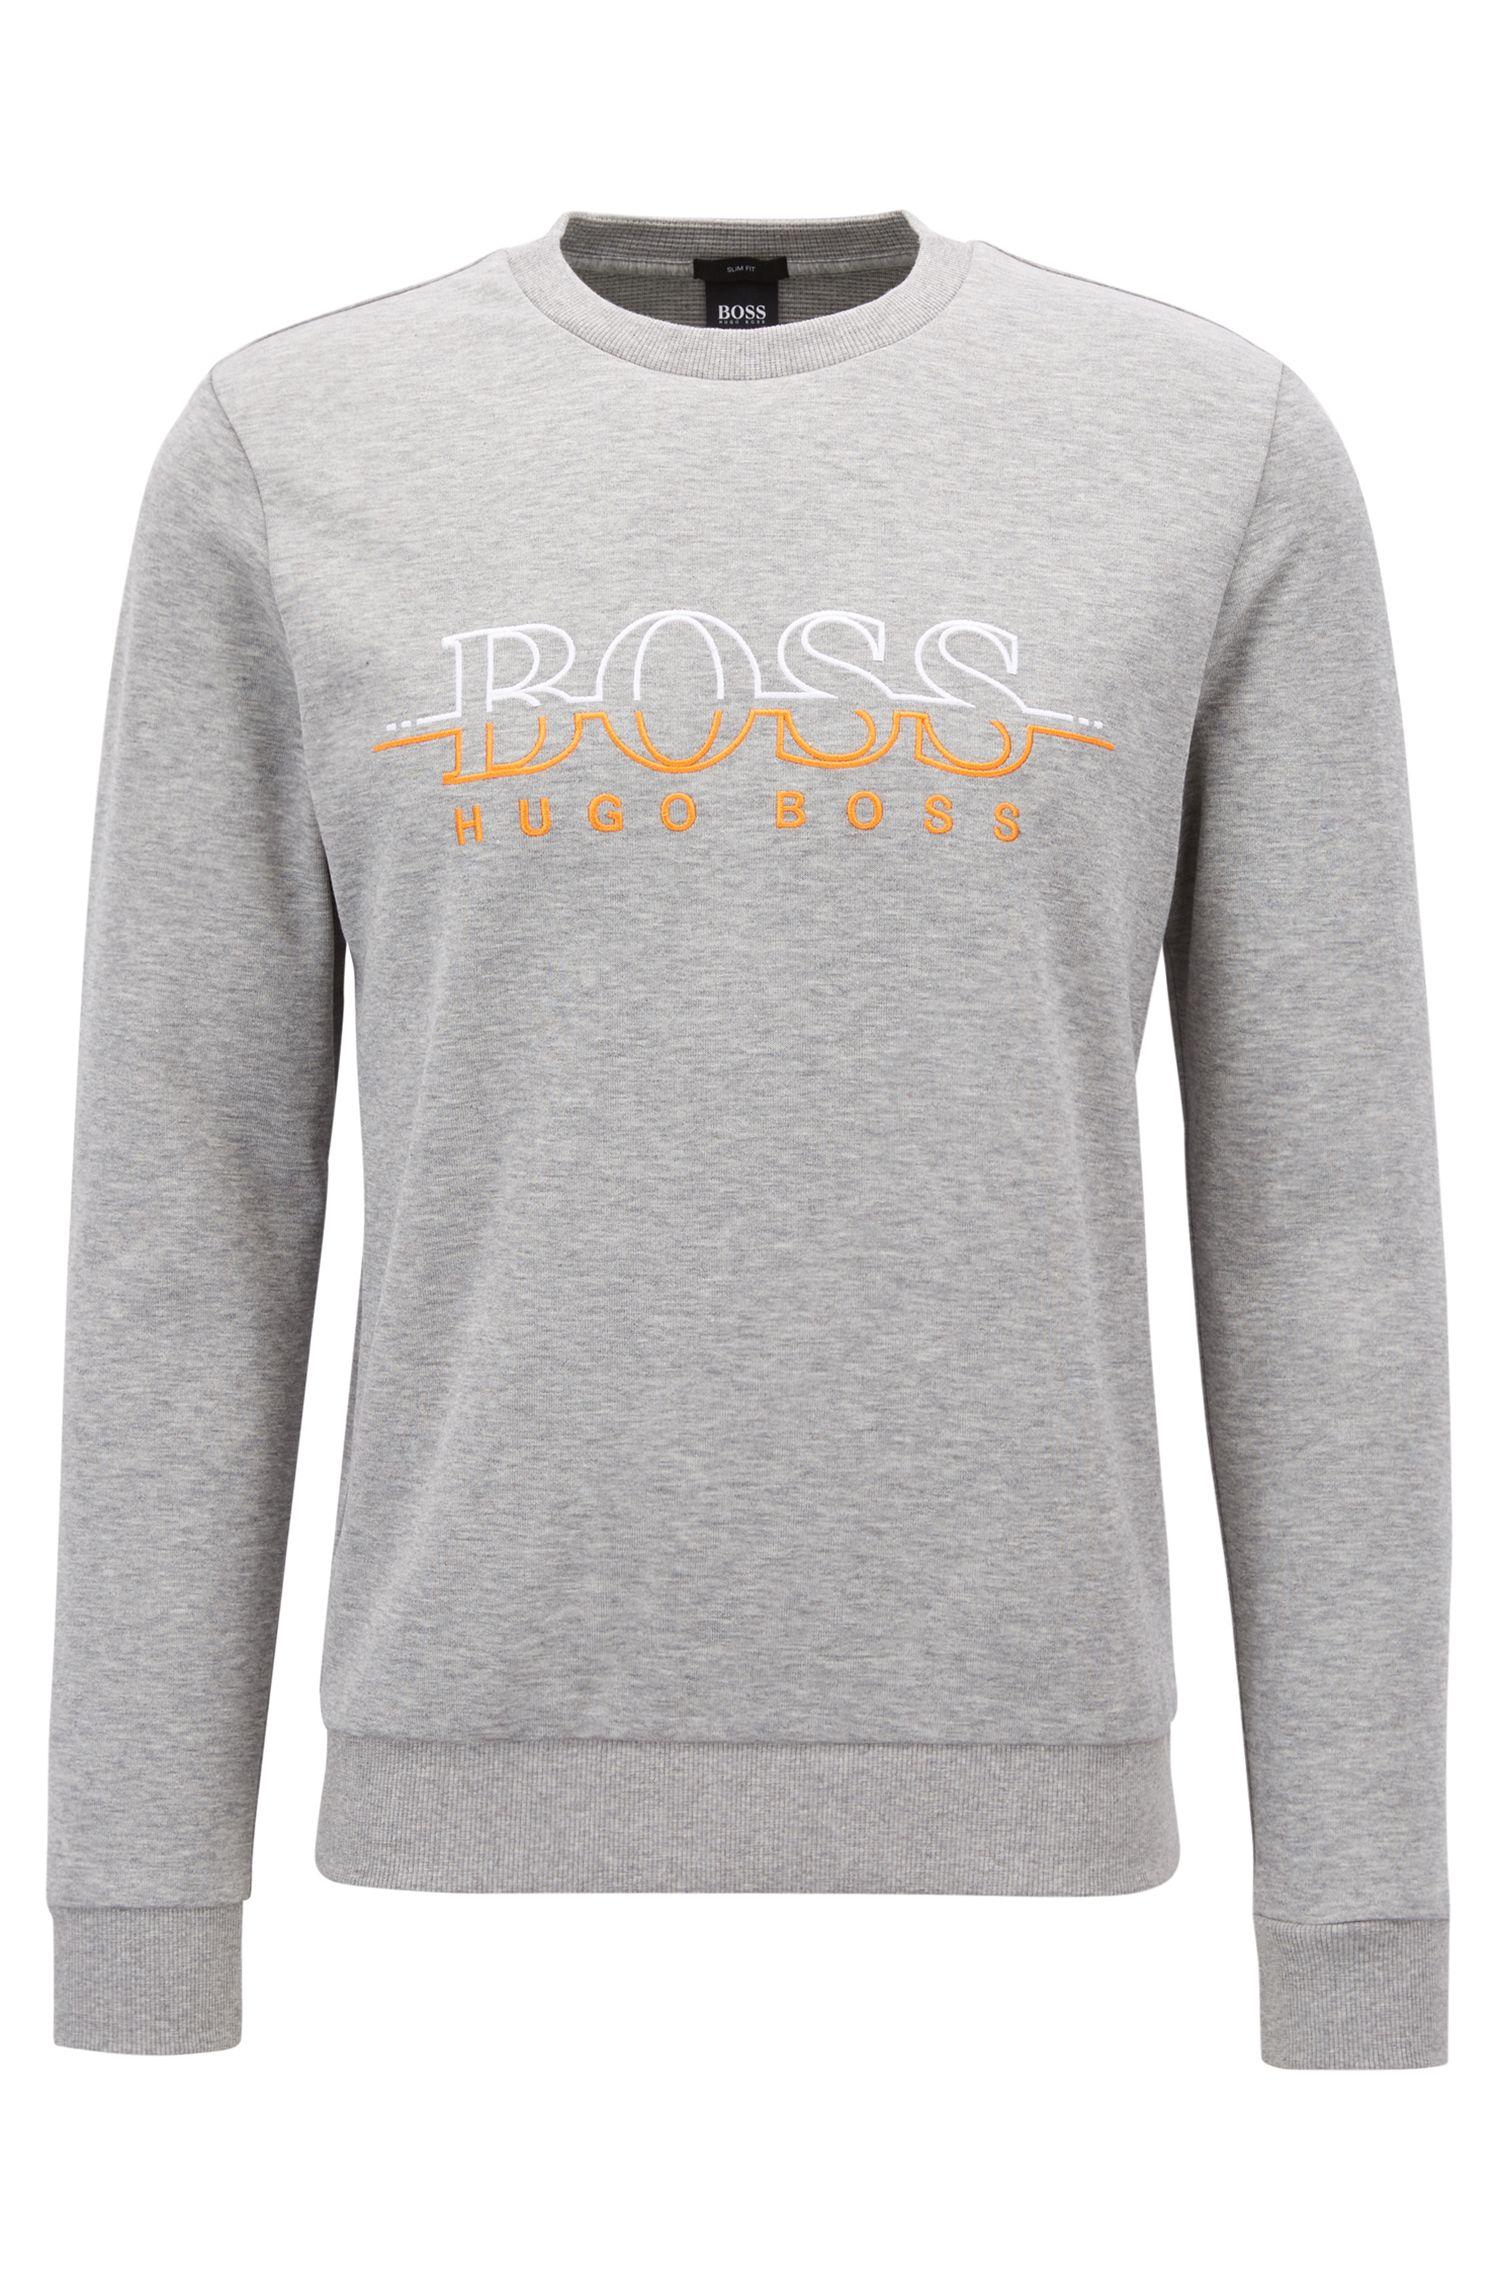 Crew-neck logo sweatshirt in a cotton blend, Light Grey